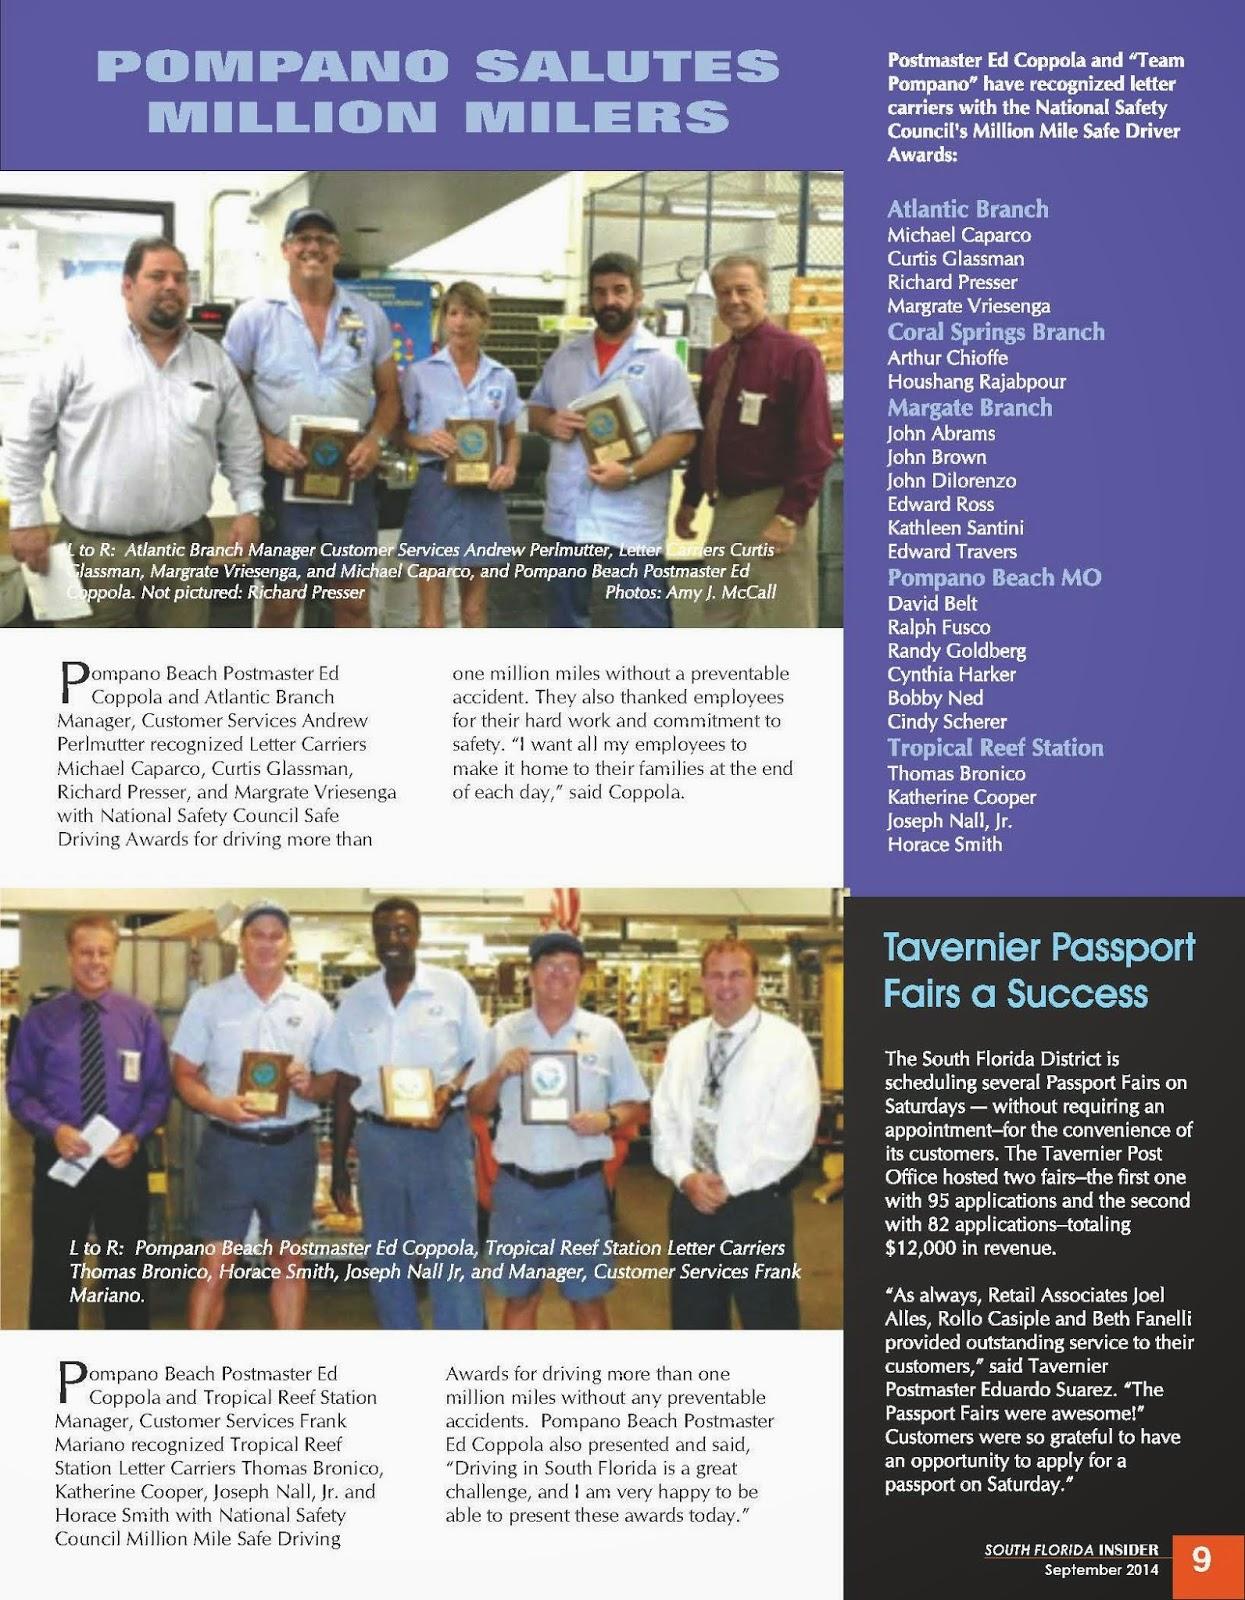 South Florida Postal Blog: September 2014 How To Apply For A Passport